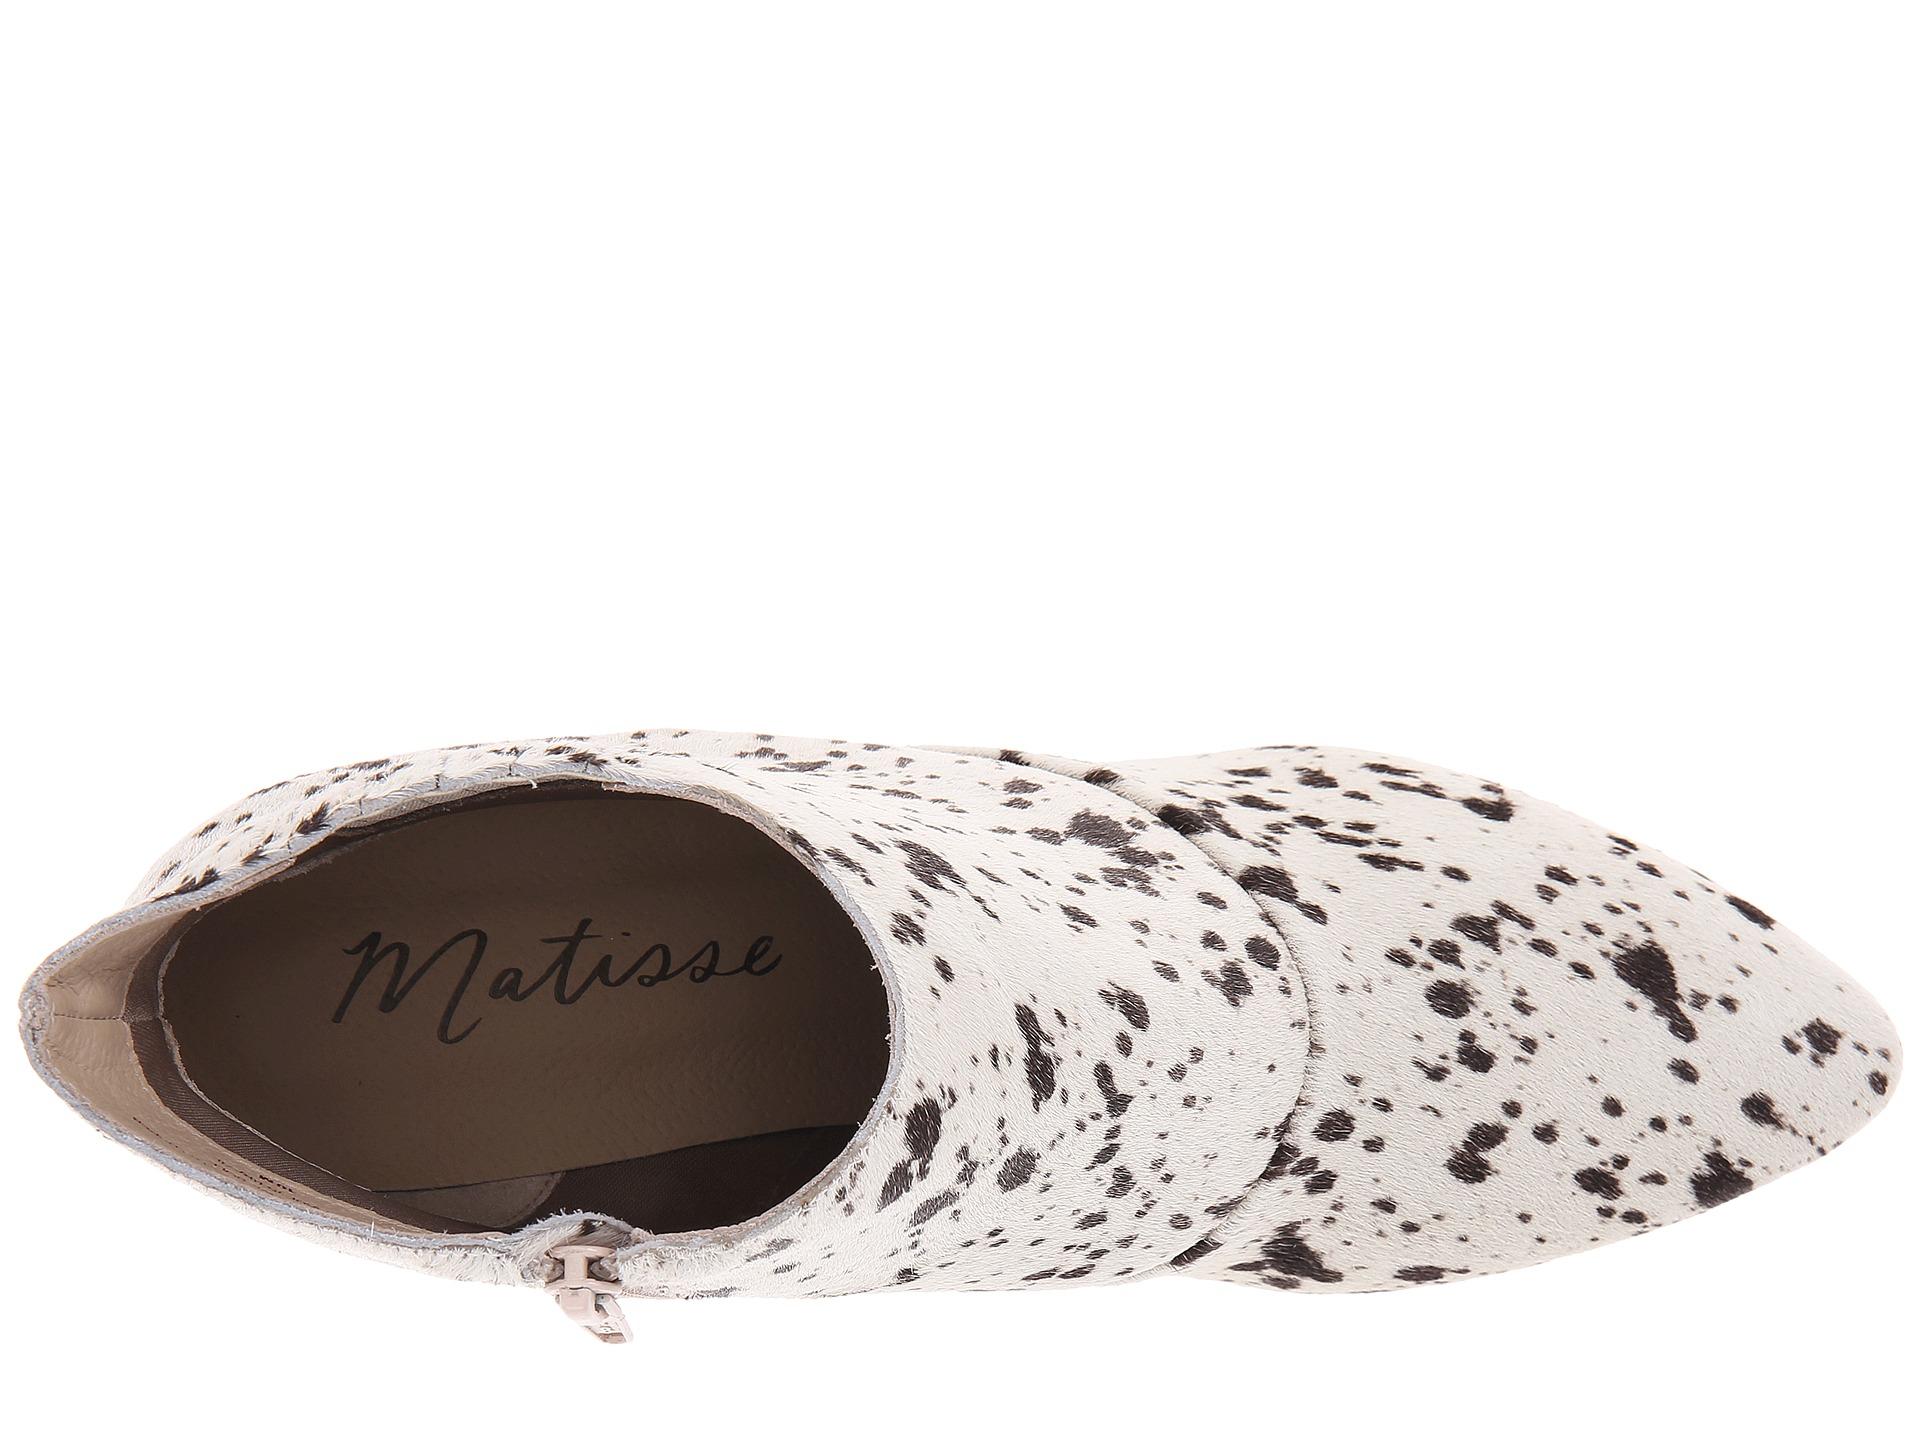 Clarks Shoes Nugent